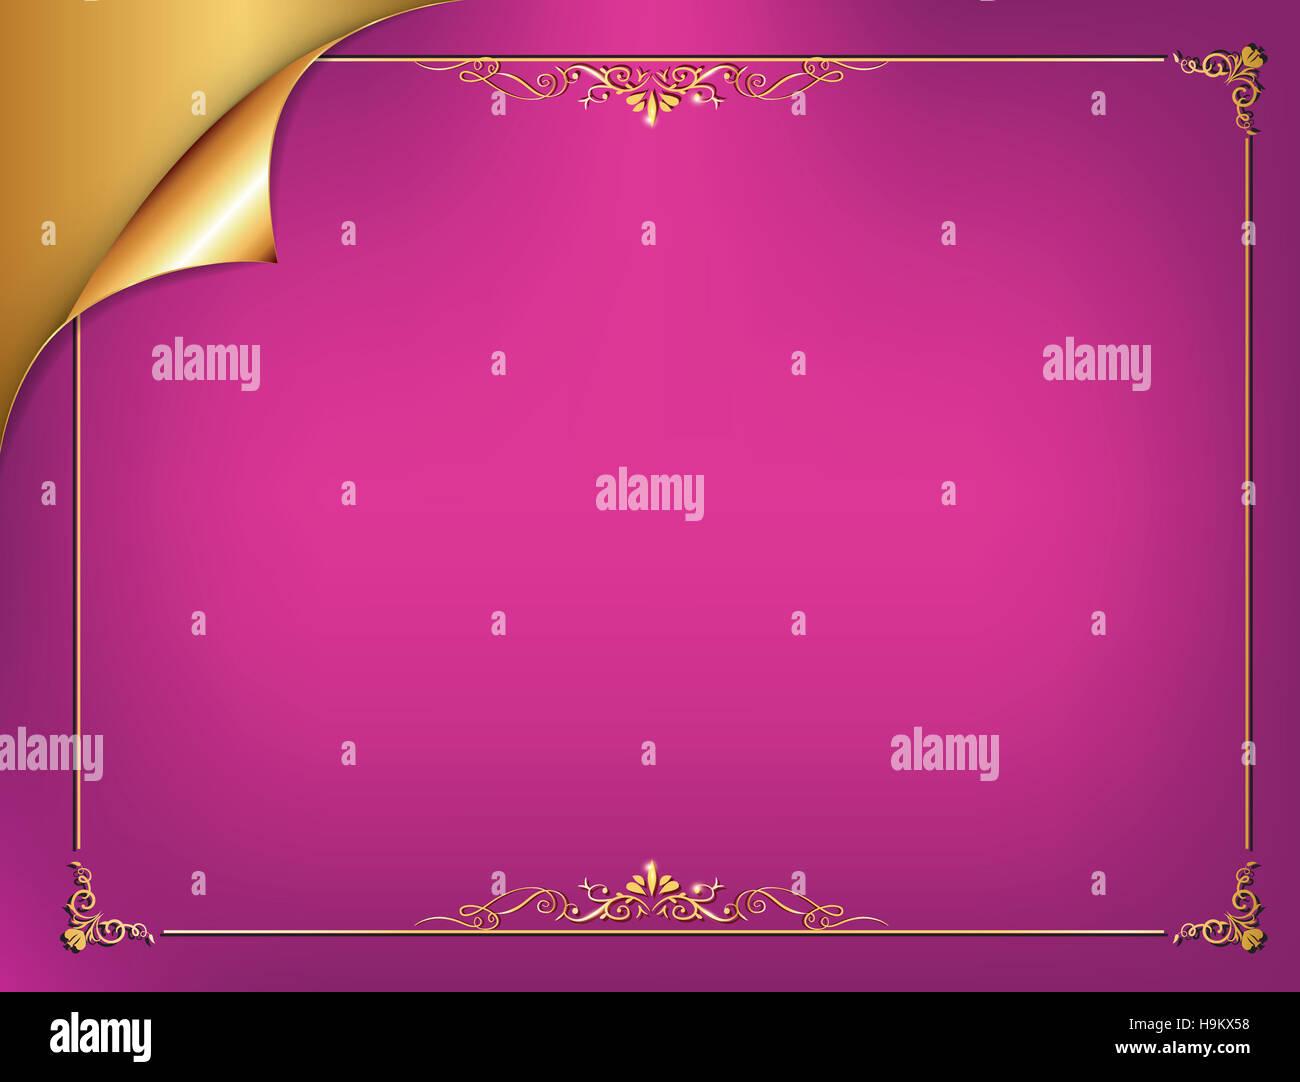 Golden Purple Elegant Background For Any Occasion Birthdays Wedding Invitations Celebration Postcards Print Colors Used